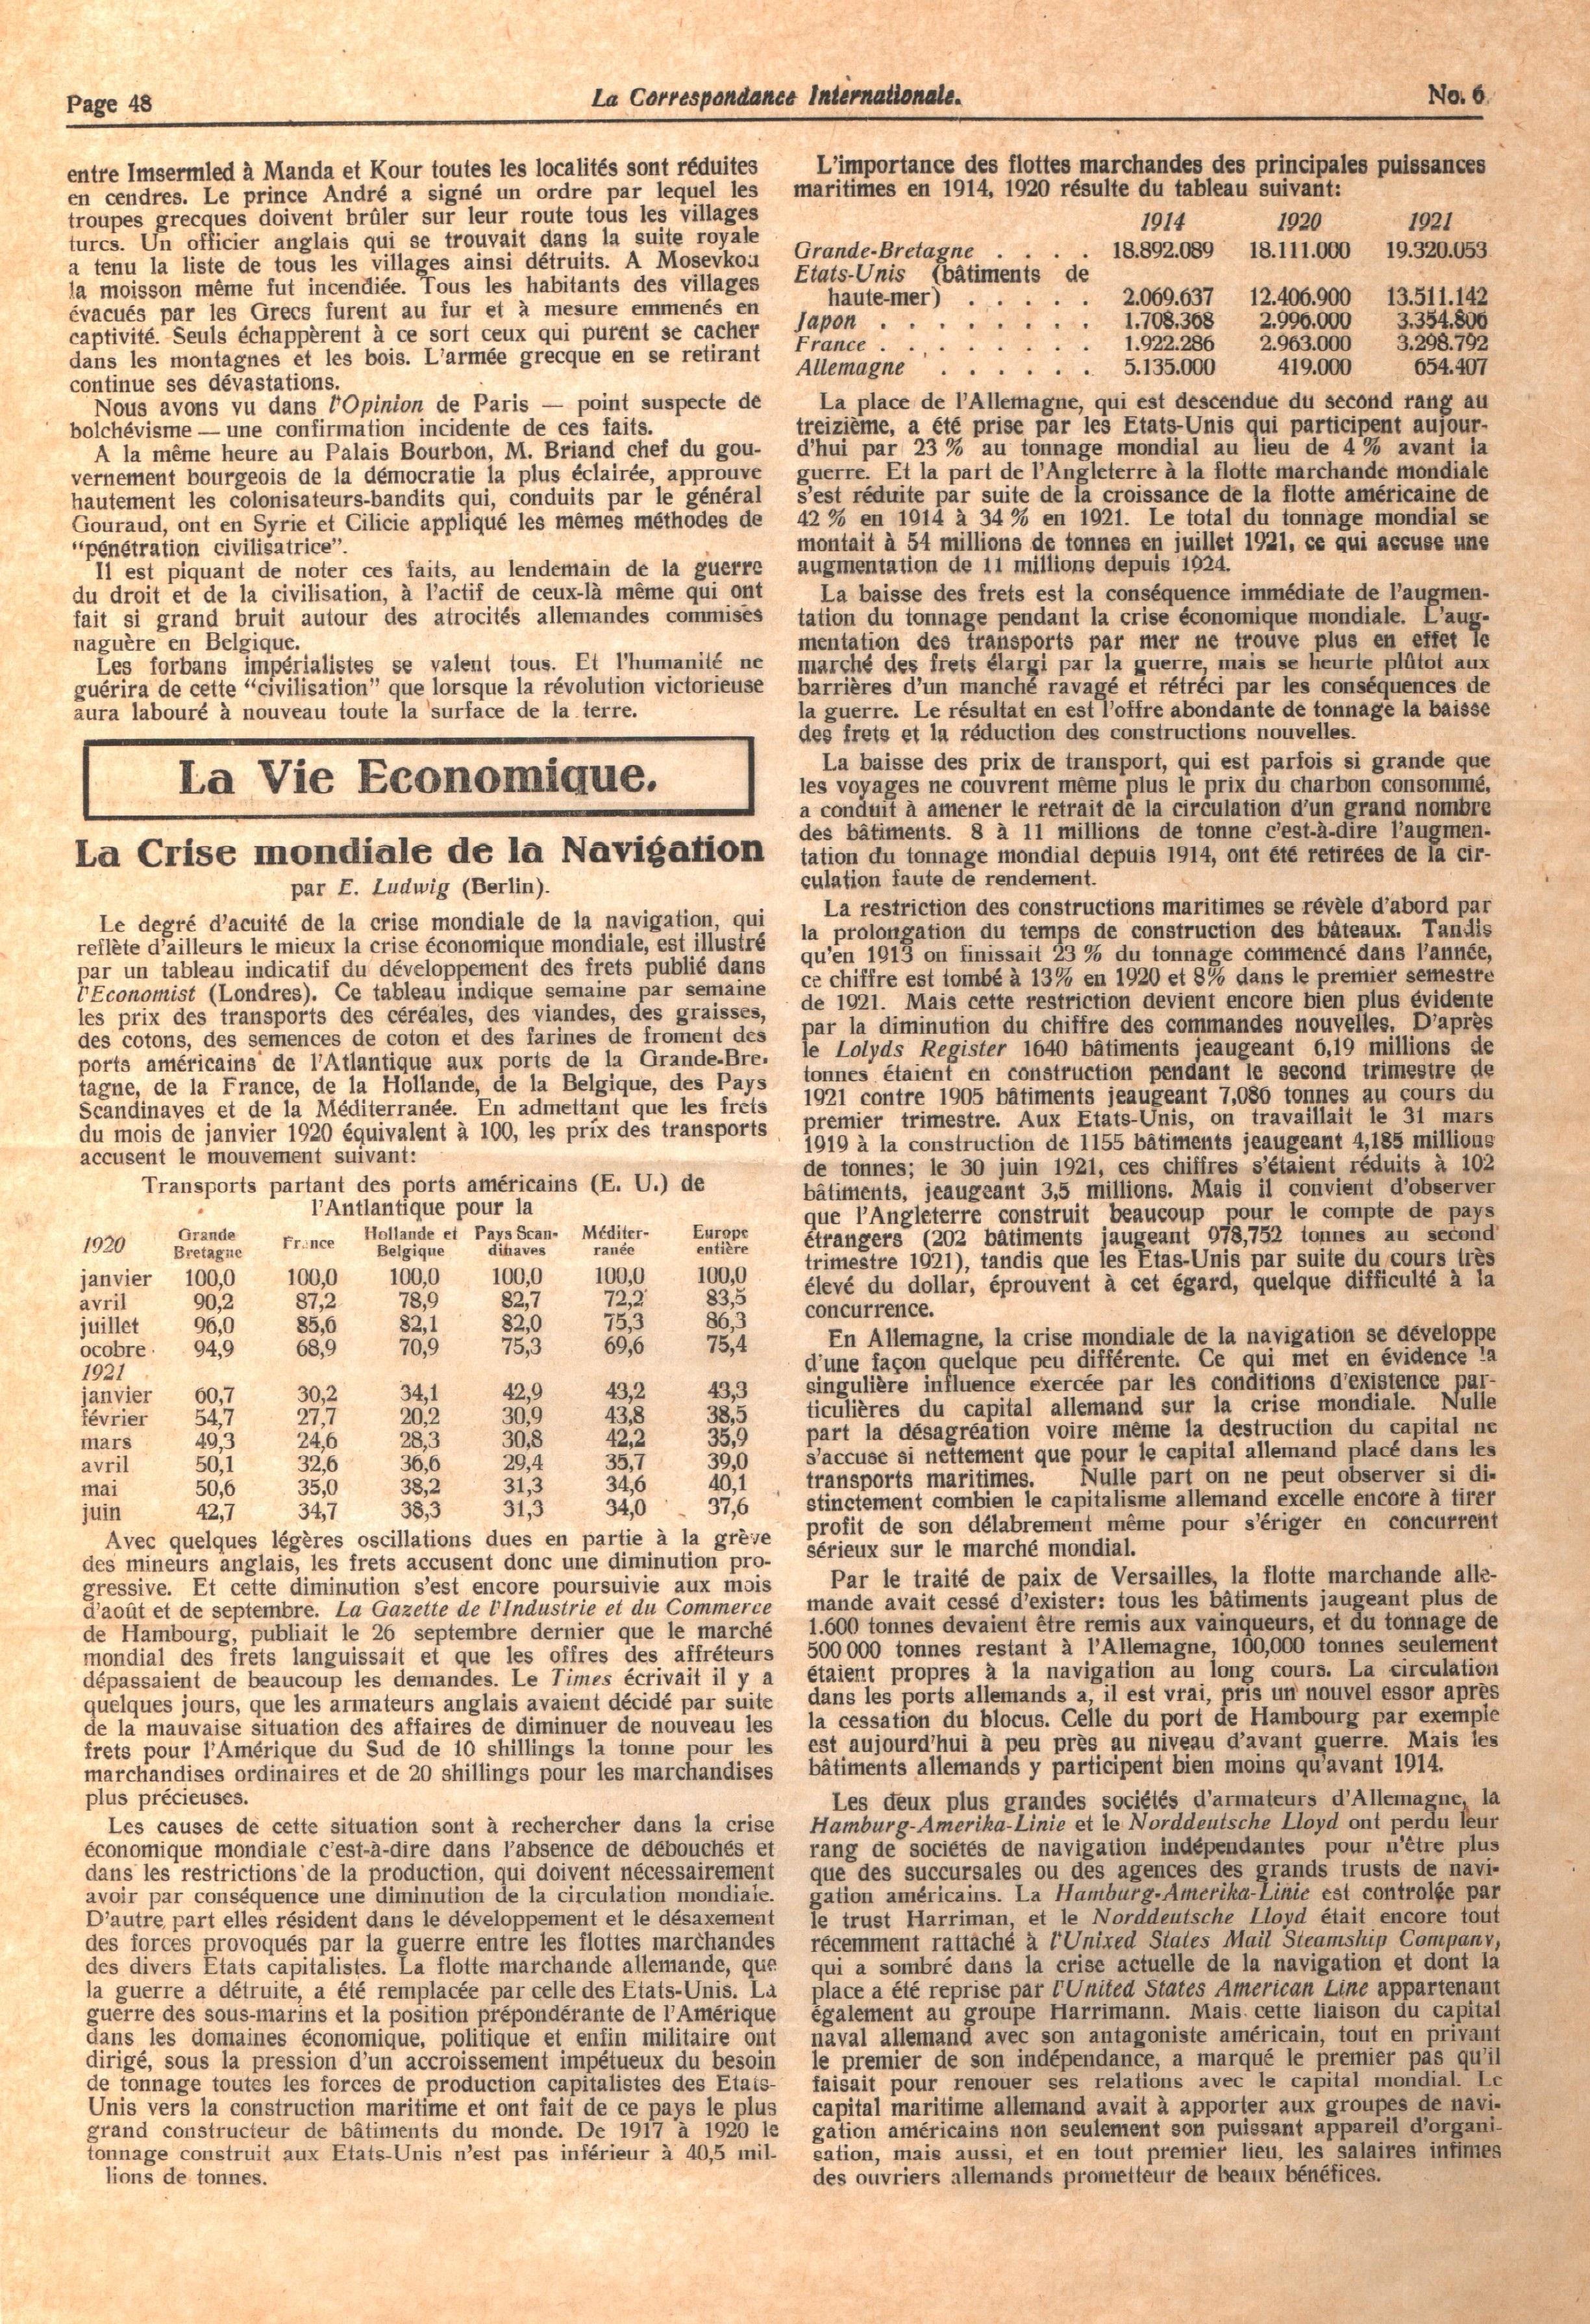 Correspondance Internationale n.6 - pag. 4